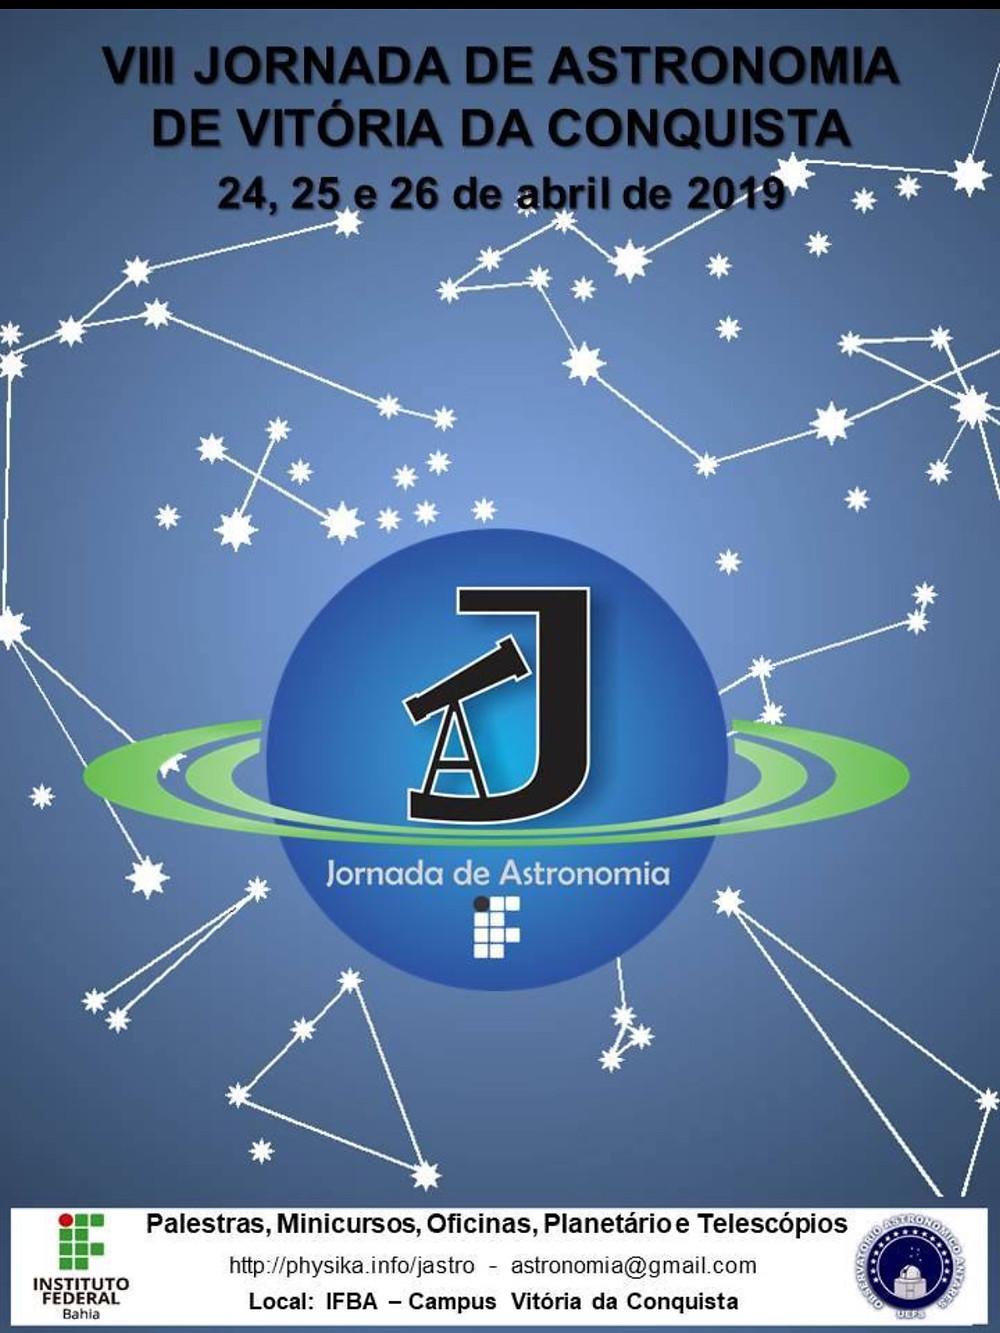 VIII JASTRO - 2019